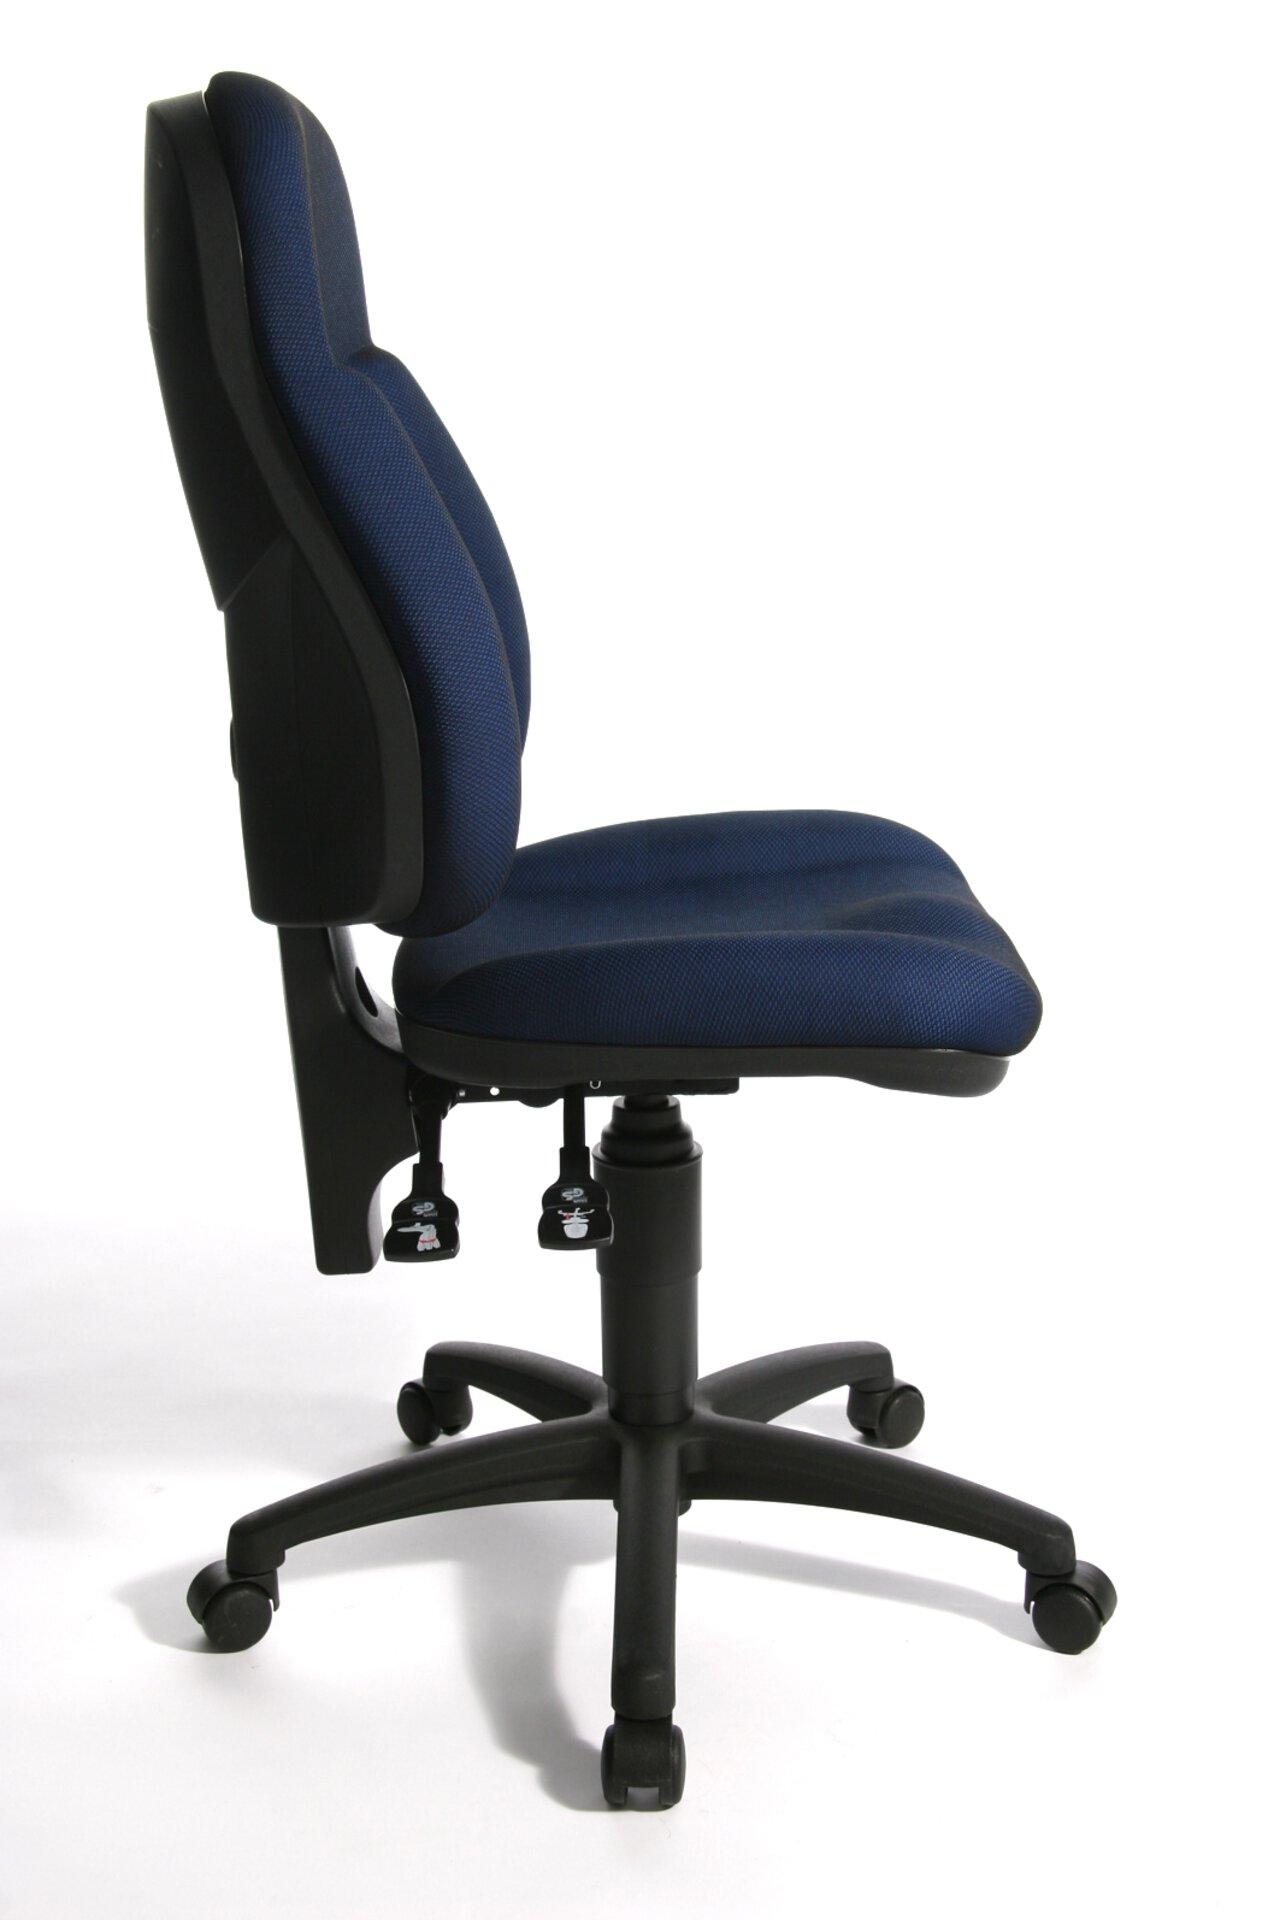 Büro-Drehstuhl WELLPOINT 10 P Topstar Textil Blau 47 x 120 x 46 cm